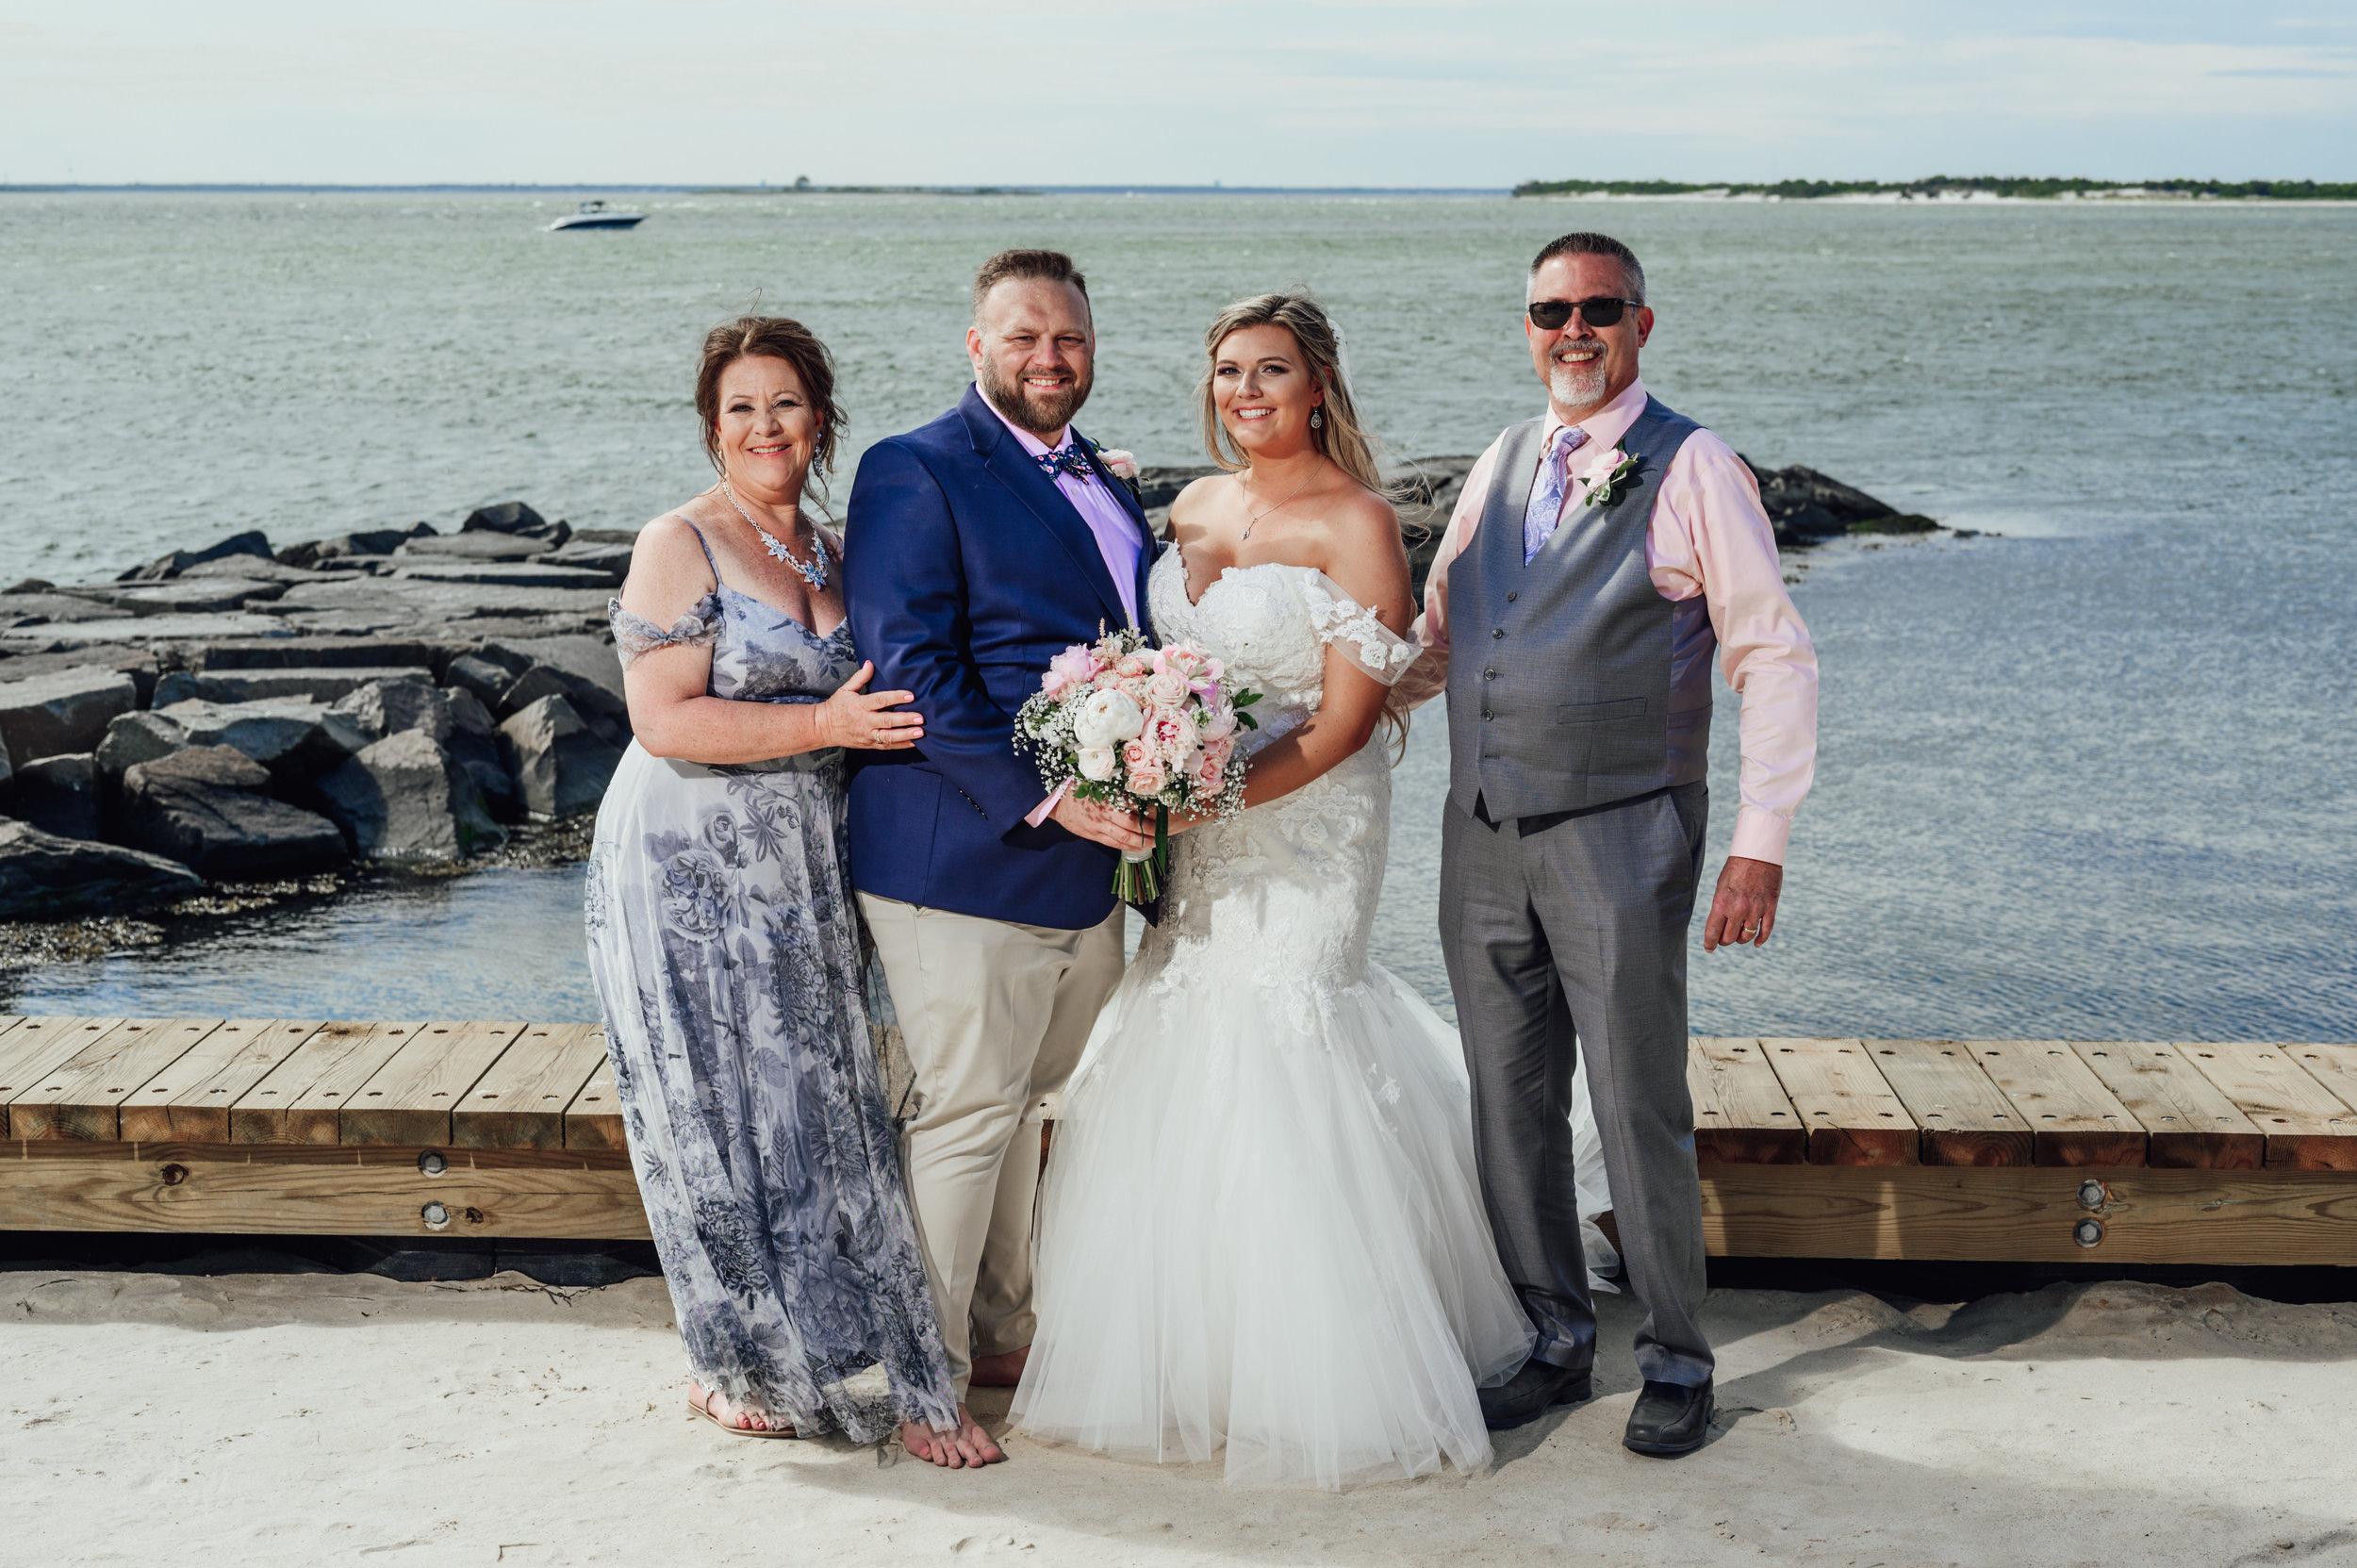 New Jersey Wedding Photographer, Felsberg Photography LBI wedding photography 76.jpg